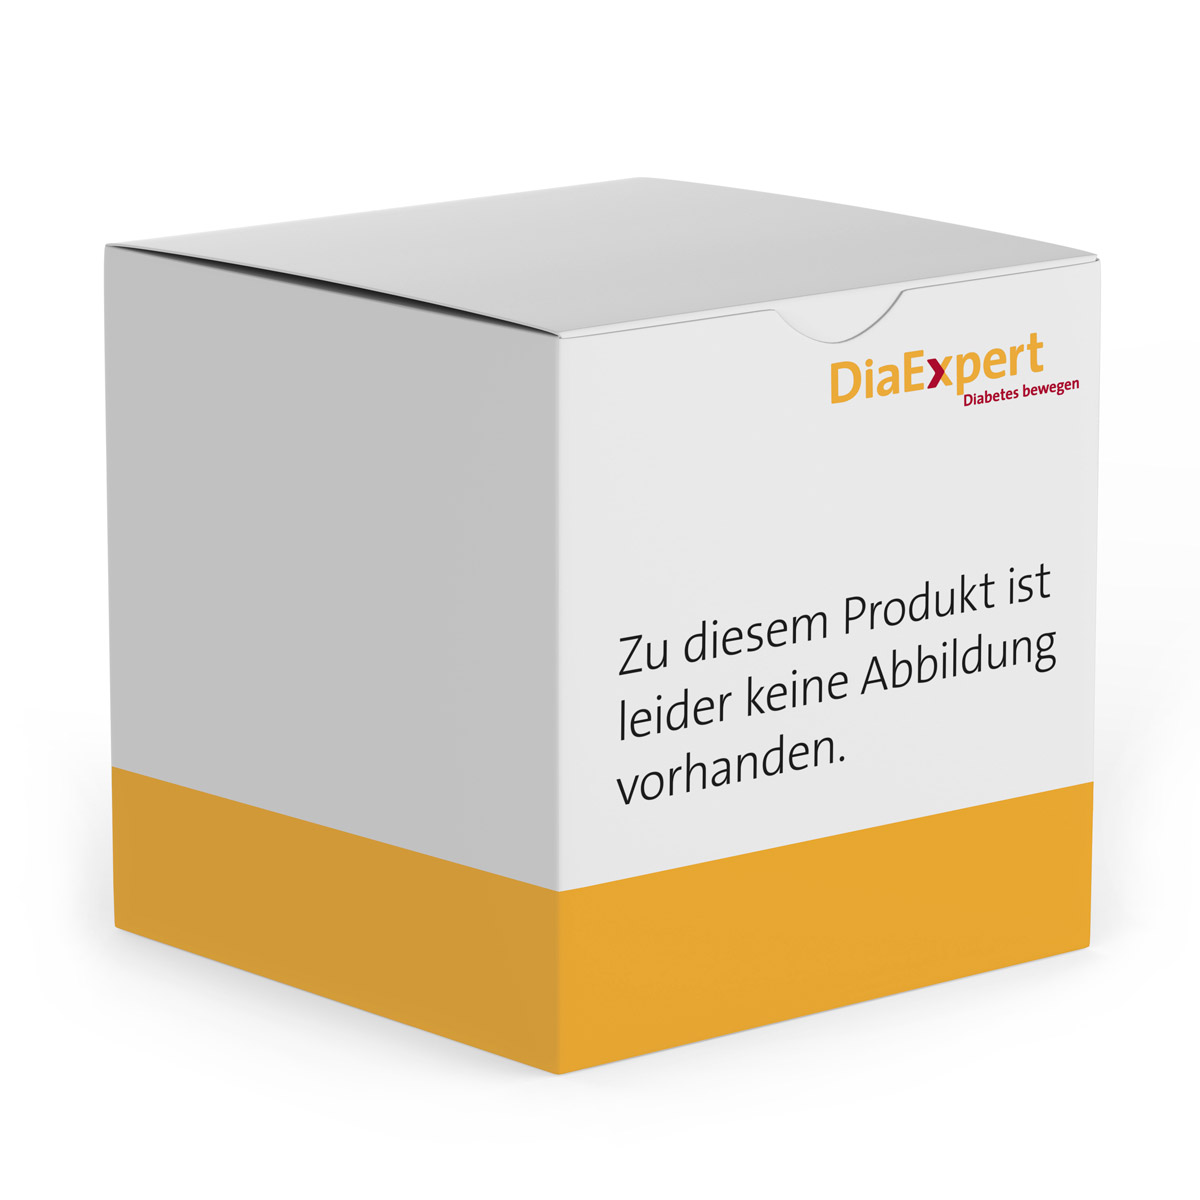 Silikonhülle schwarz MiniMed 640G 3 ml